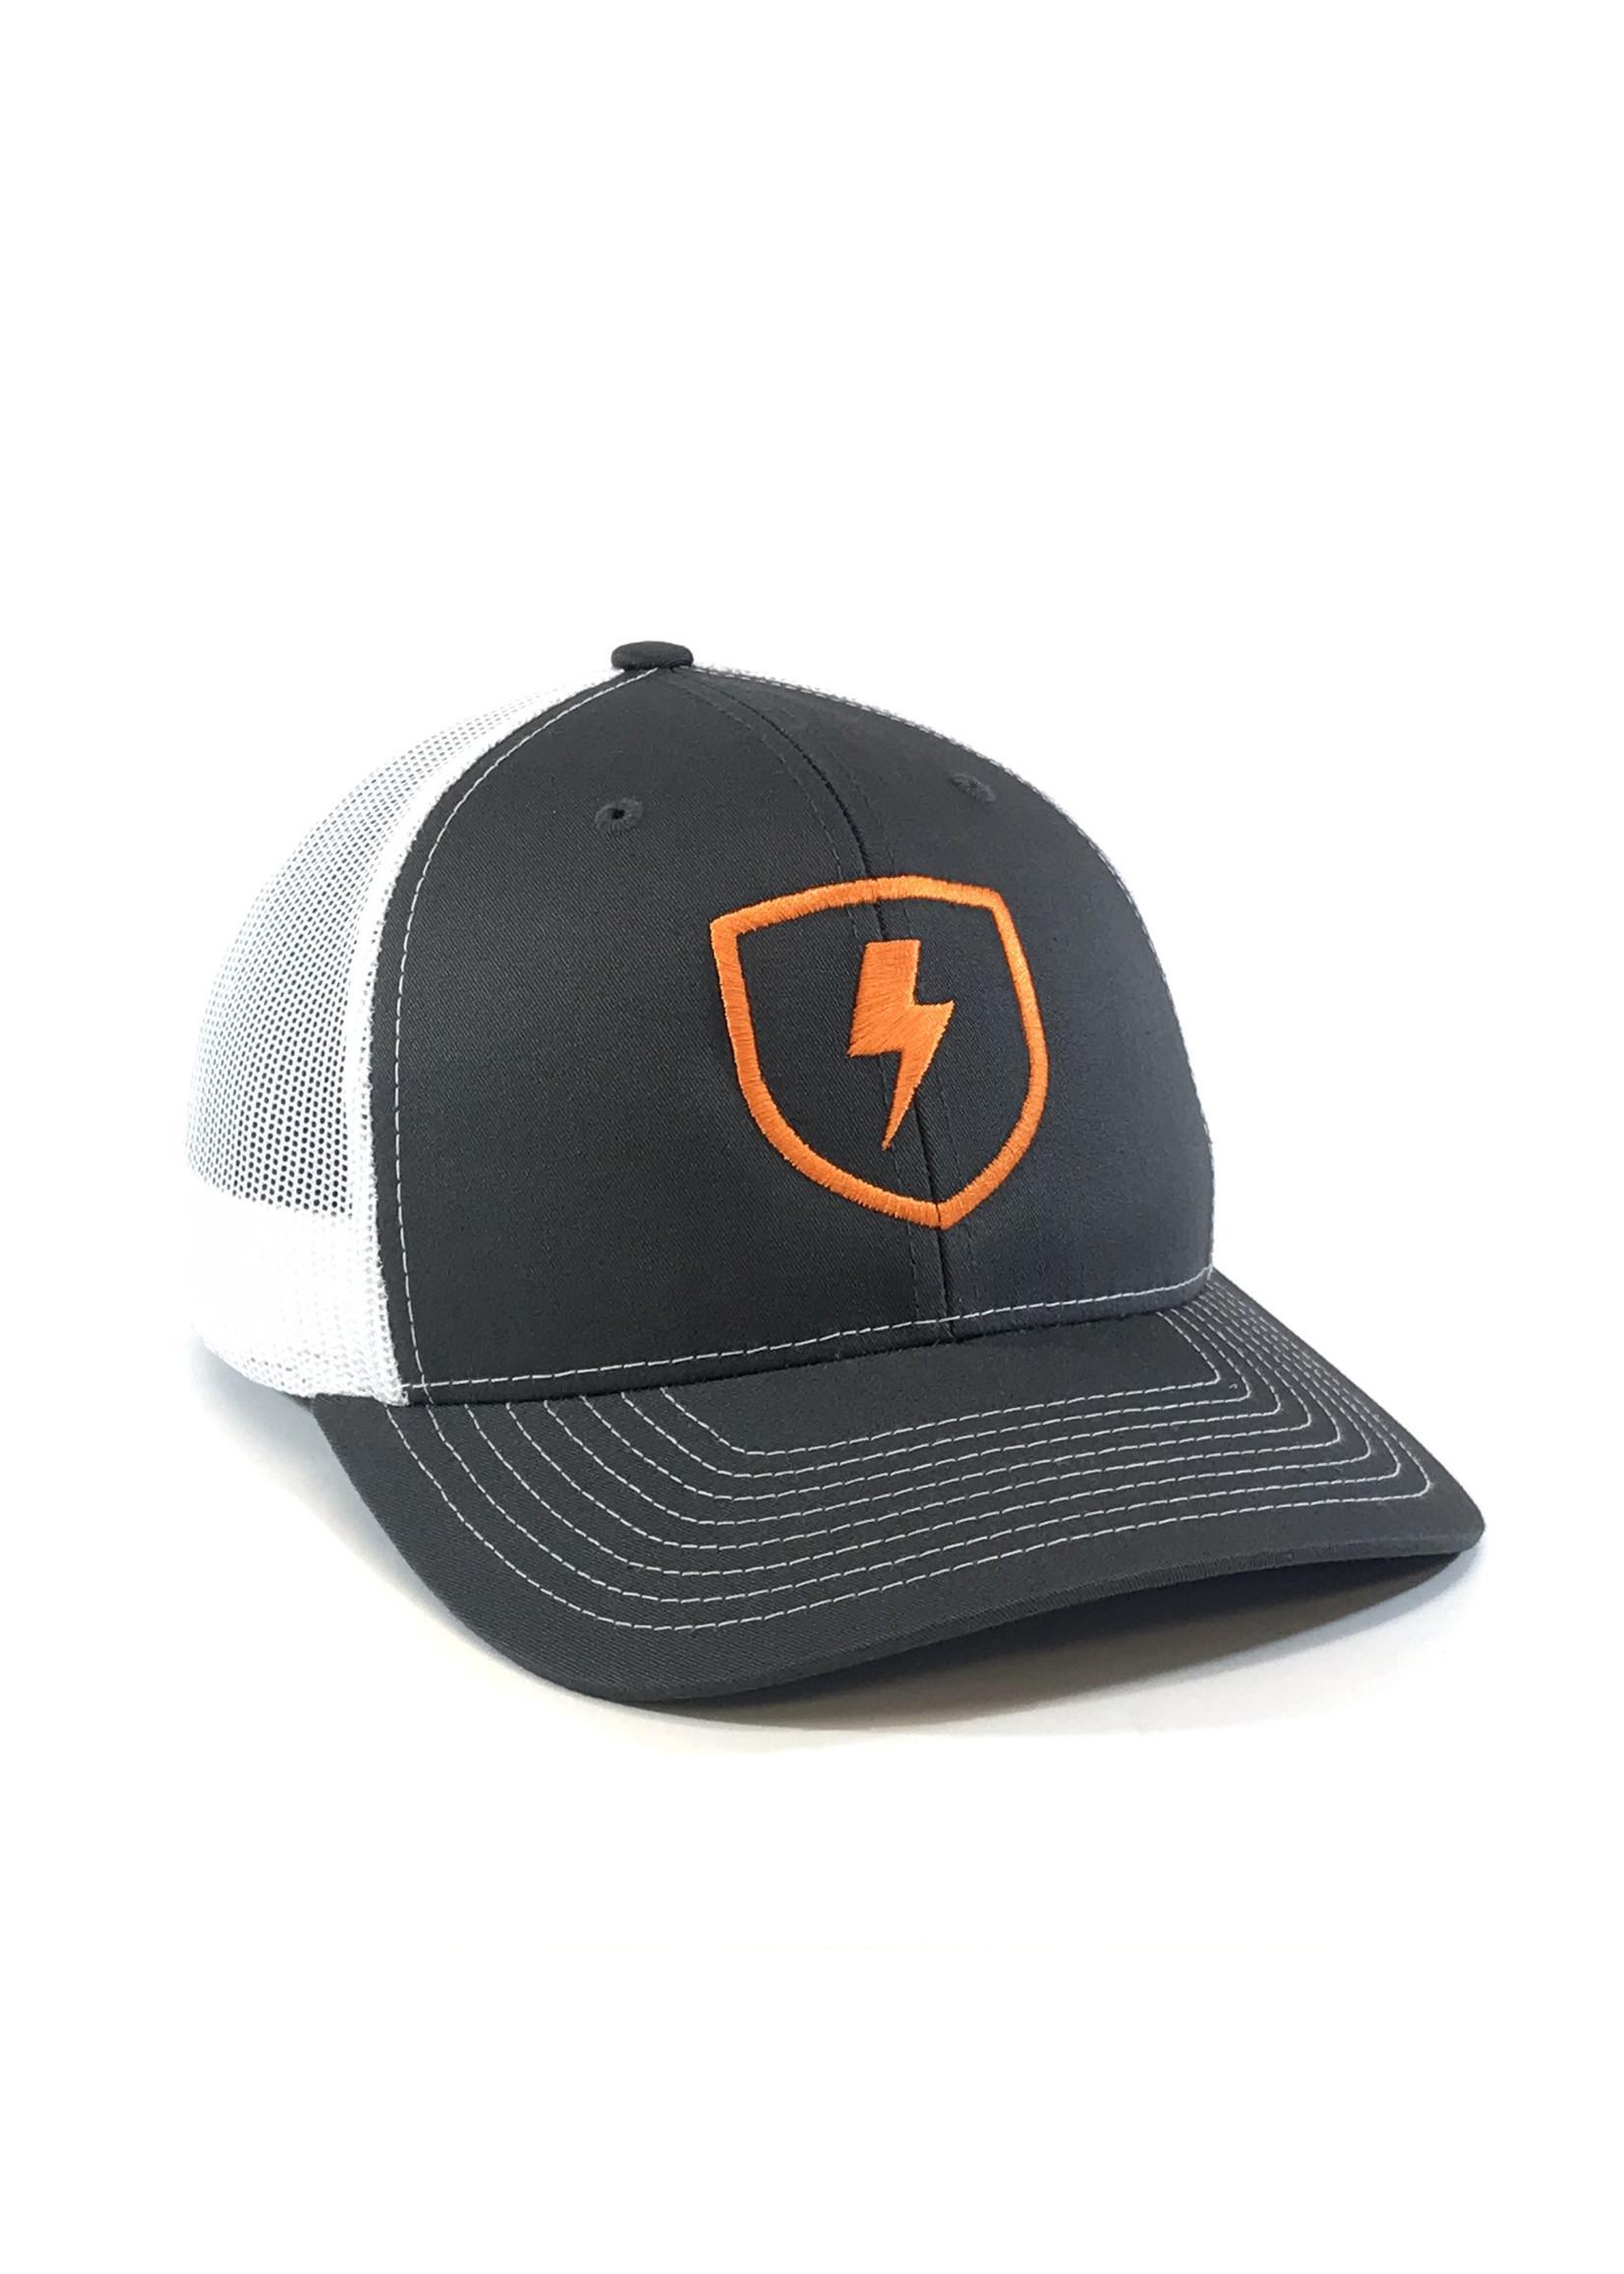 Defender Outdoors Shield Trucker Hat